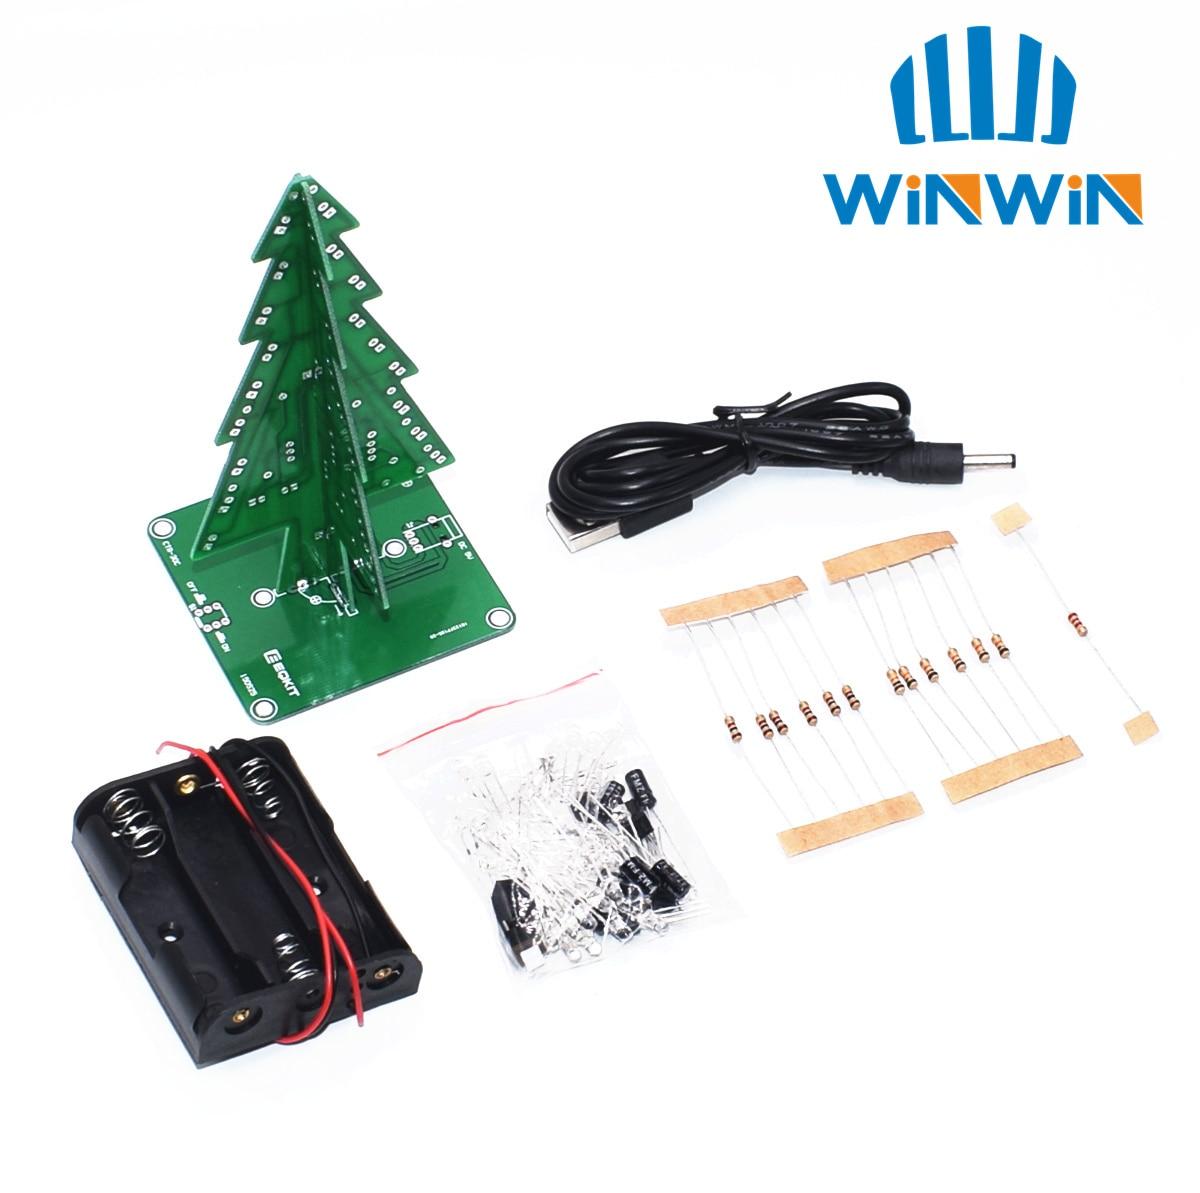 Diy-Kit Flash-Circuit-Kit Three-Dimensional 3D LED Suite Christmas-Tree Fun Electronic